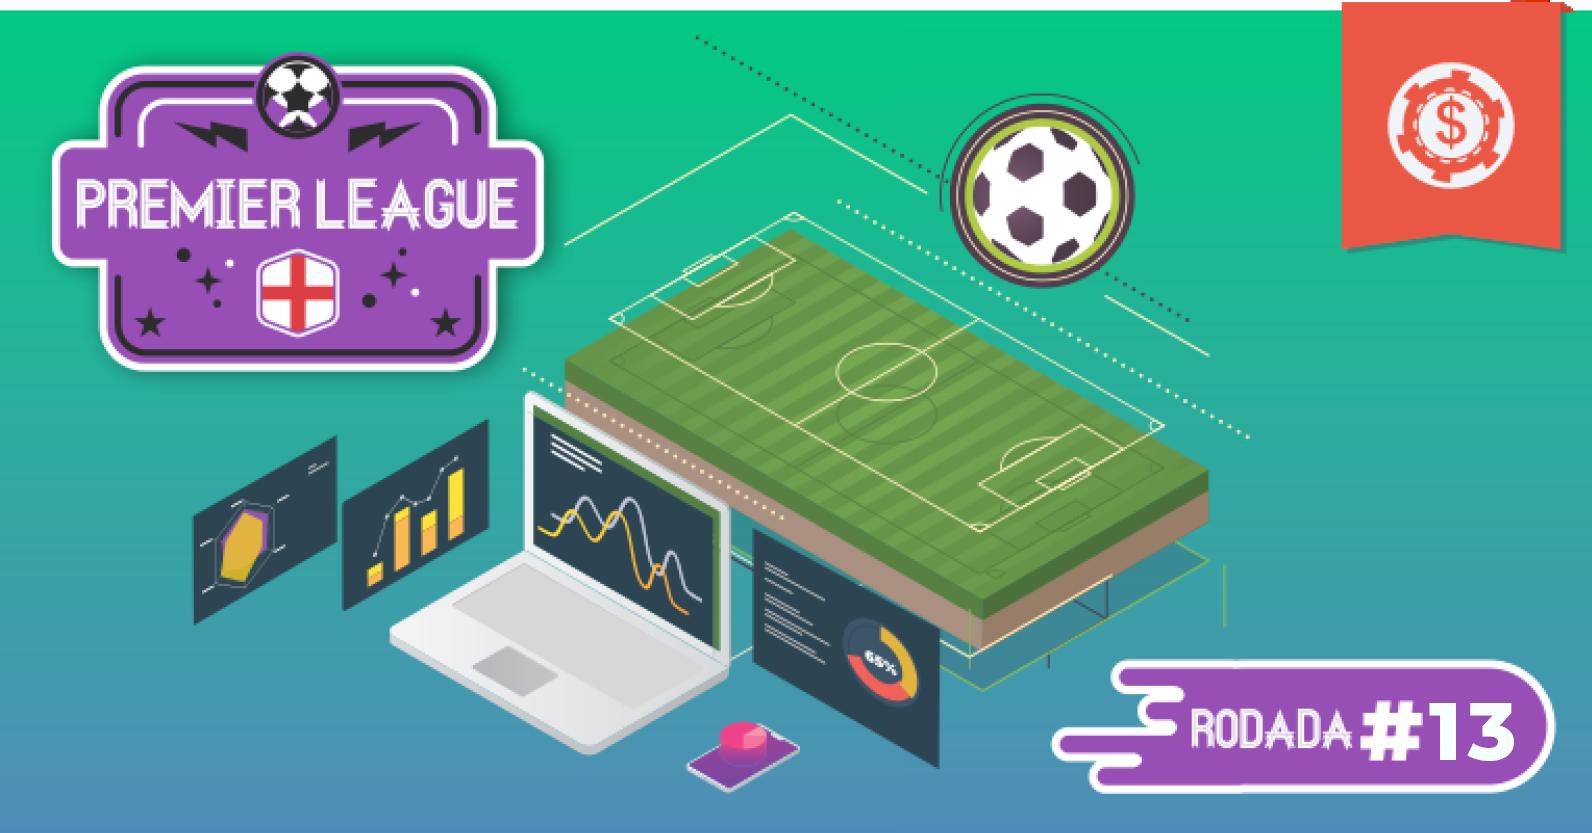 prognosticos-premier-league-campeonato-ingles-apostas-rodada-13